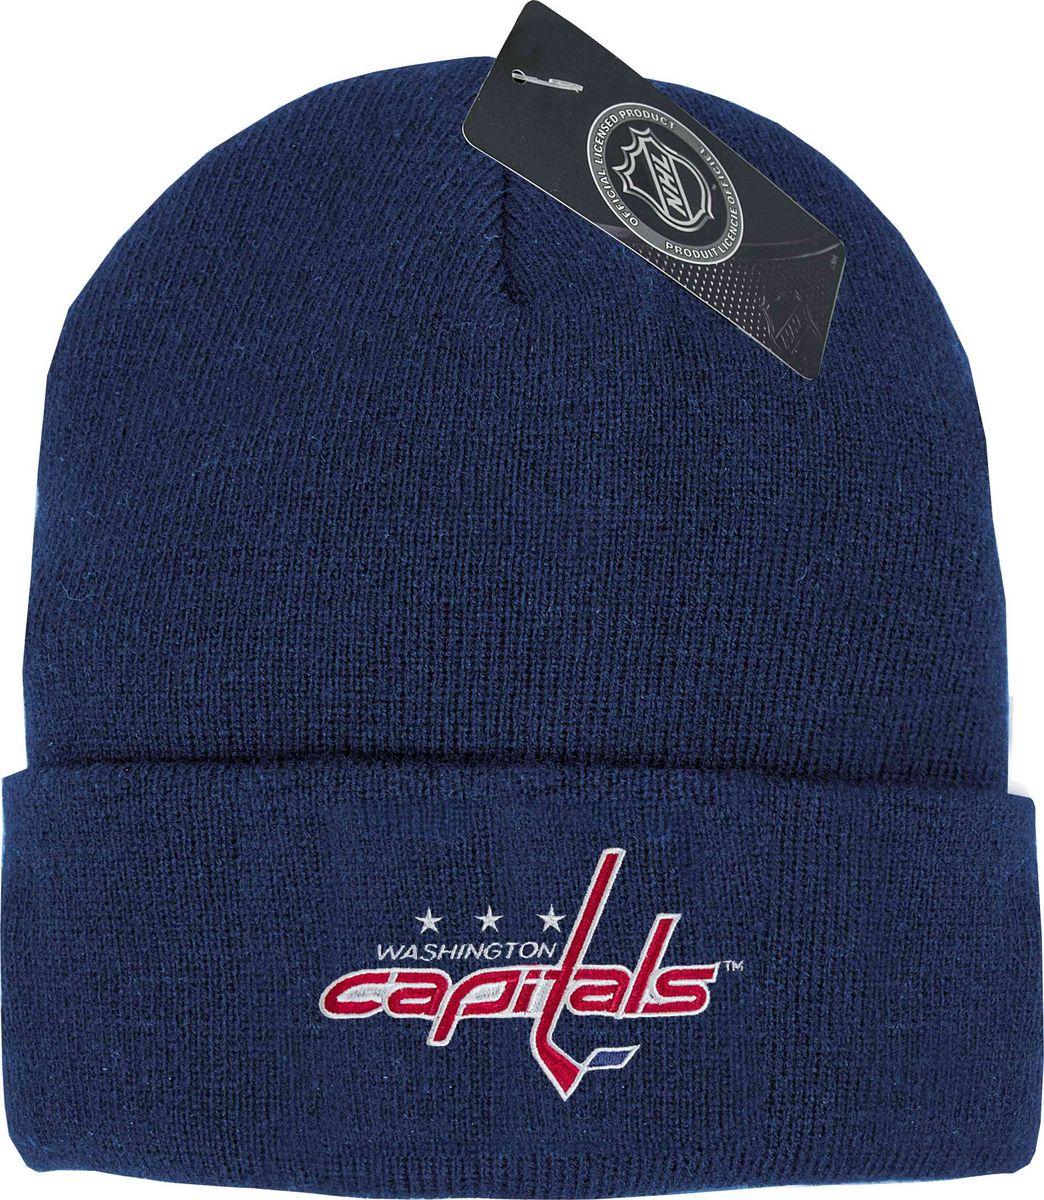 Шапка мужская Atributika & Club Washington Capitals, цвет: синий. 59010. Размер 55/5859010